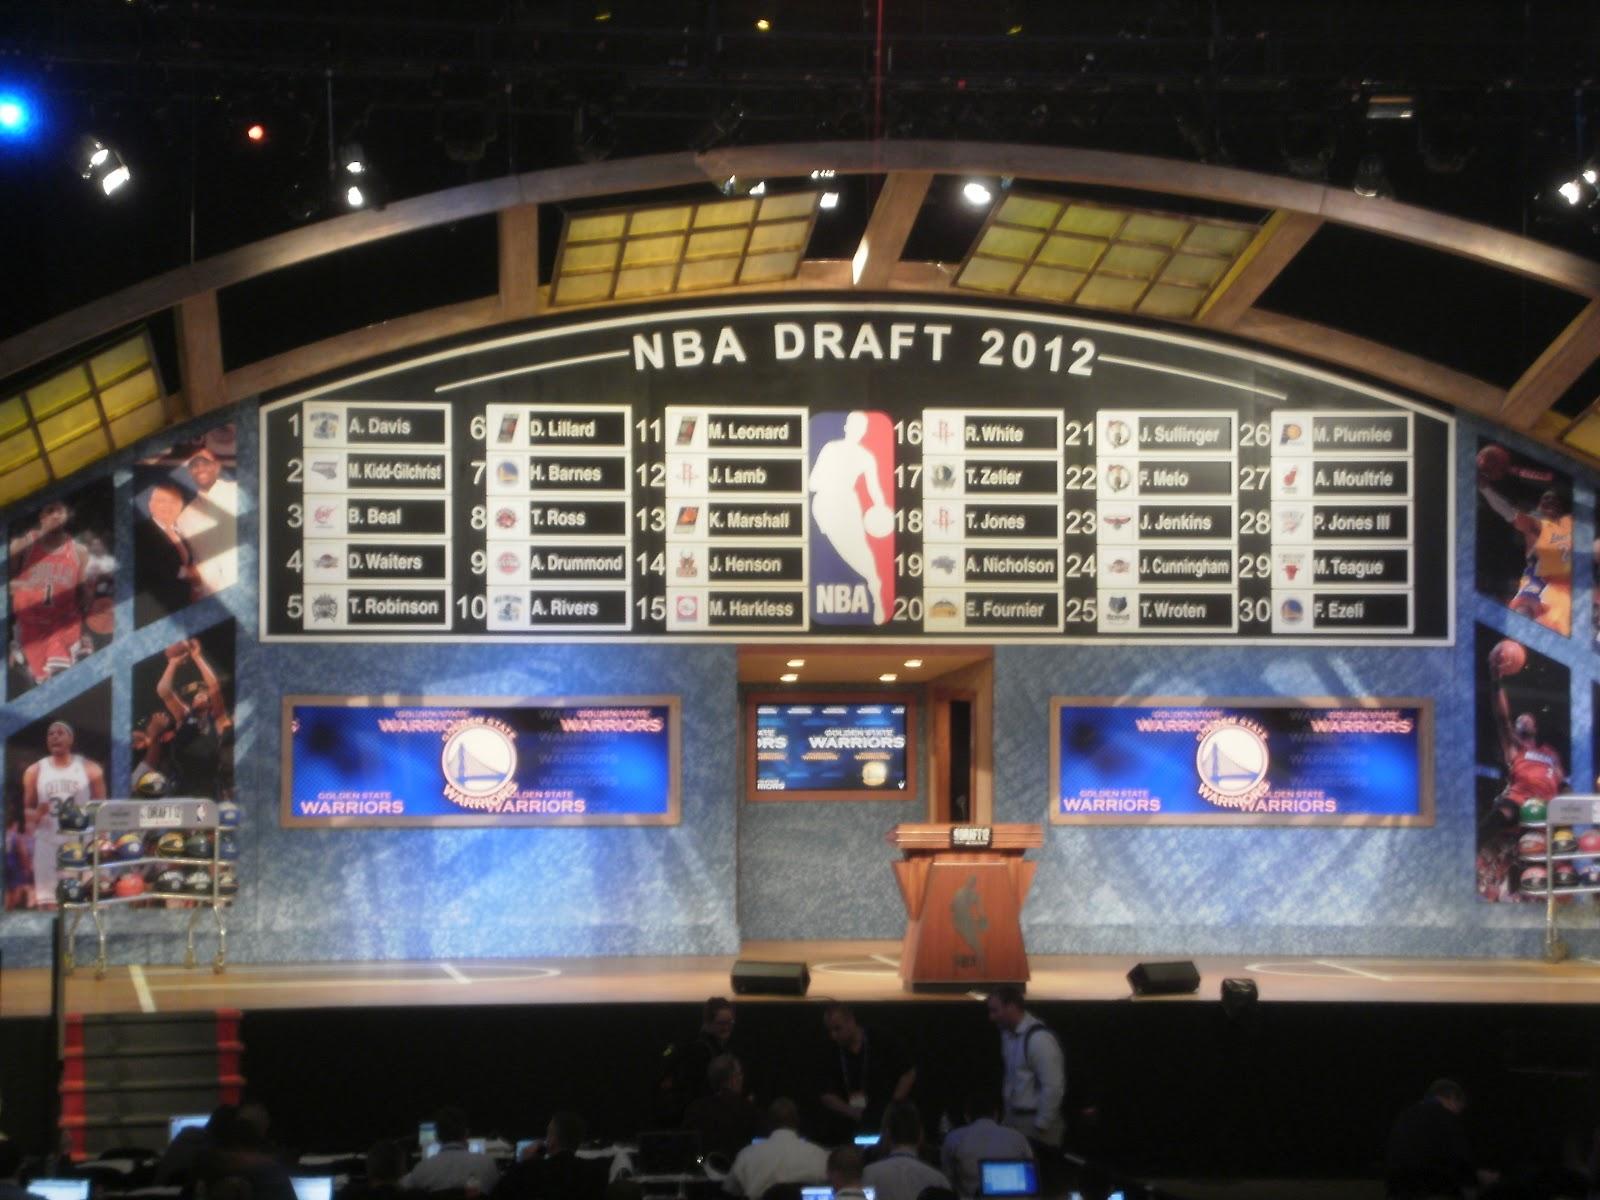 Nba Draft 2012